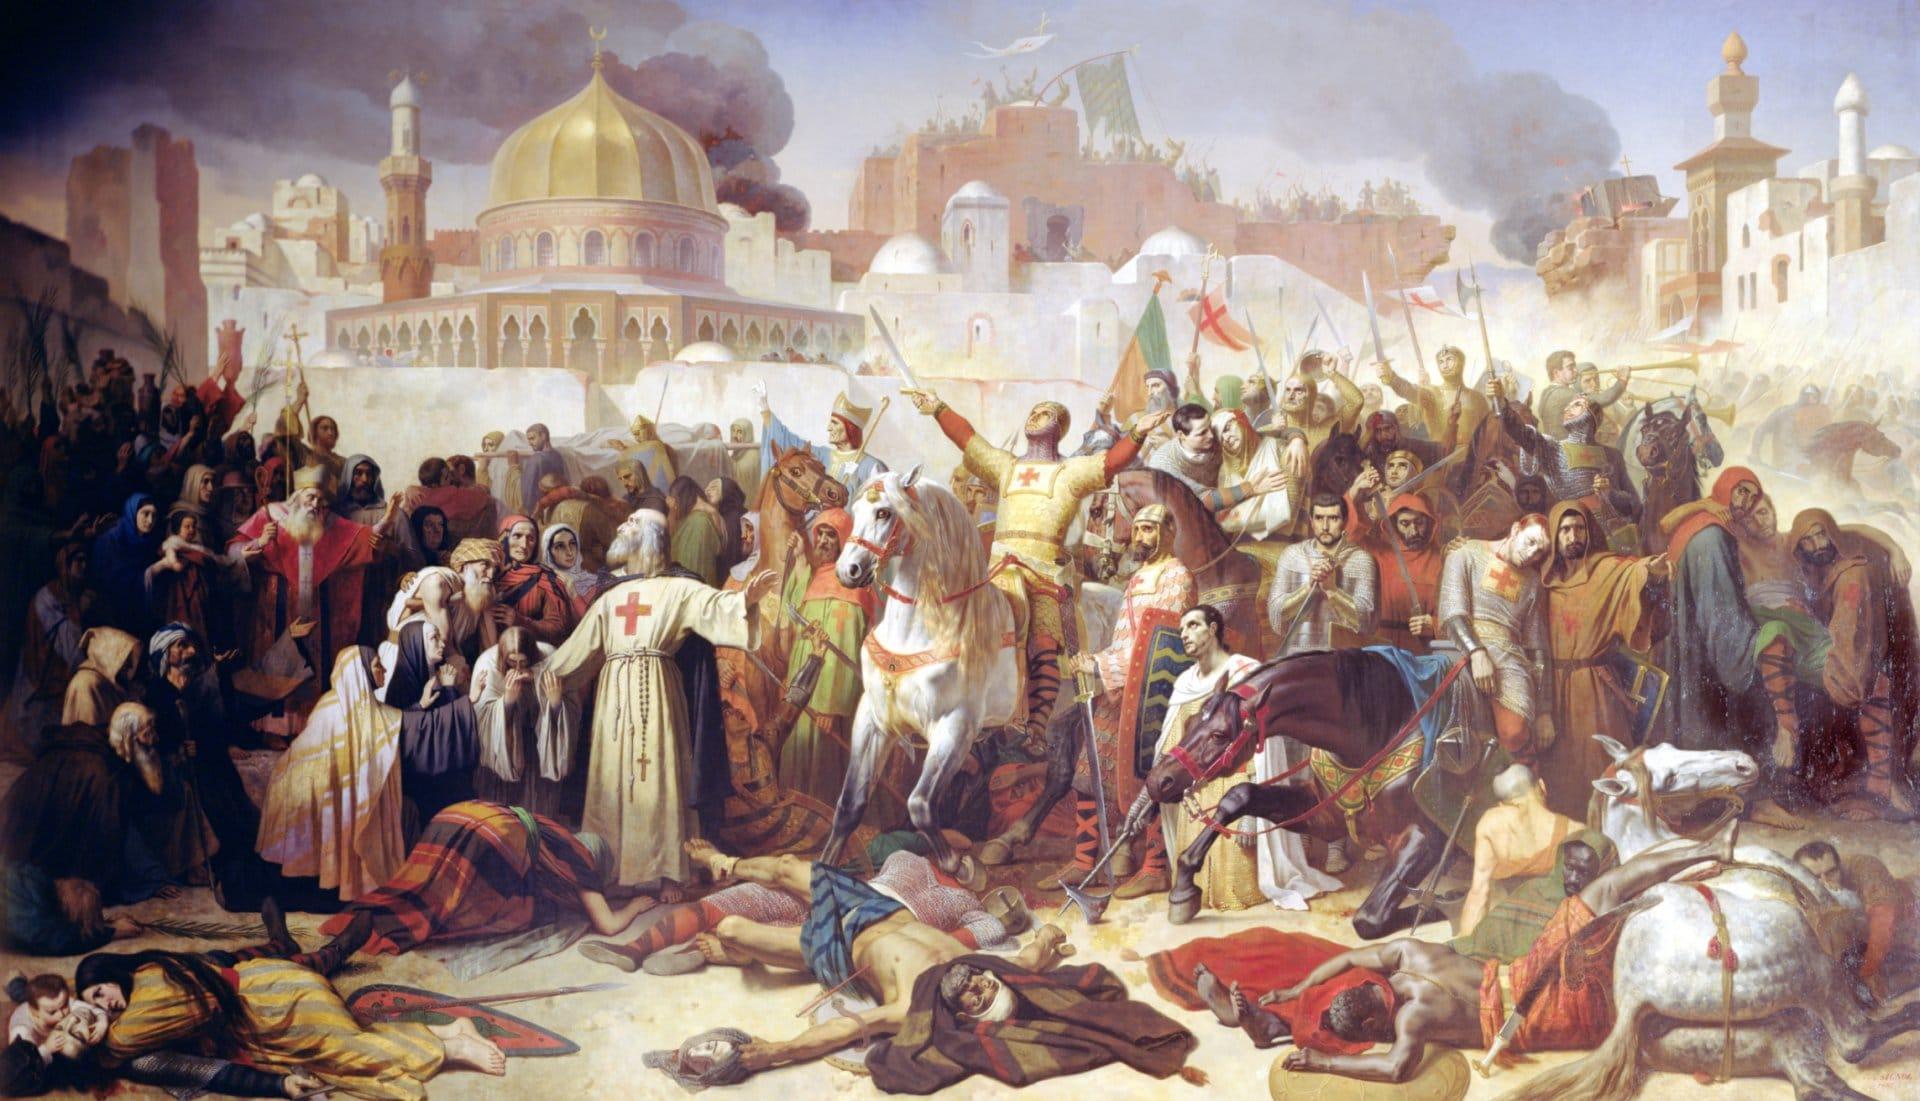 Bild: Einnahme Jerusalems durch die Kreuzfahrer am 15. Juli 1099   Giraudon / The Bridgeman Art LibraryÉmile Signol [Public domain] (https://commons.wikimedia.org/wiki/File:Counquest_of_Jeusalem_(1099).jpg)